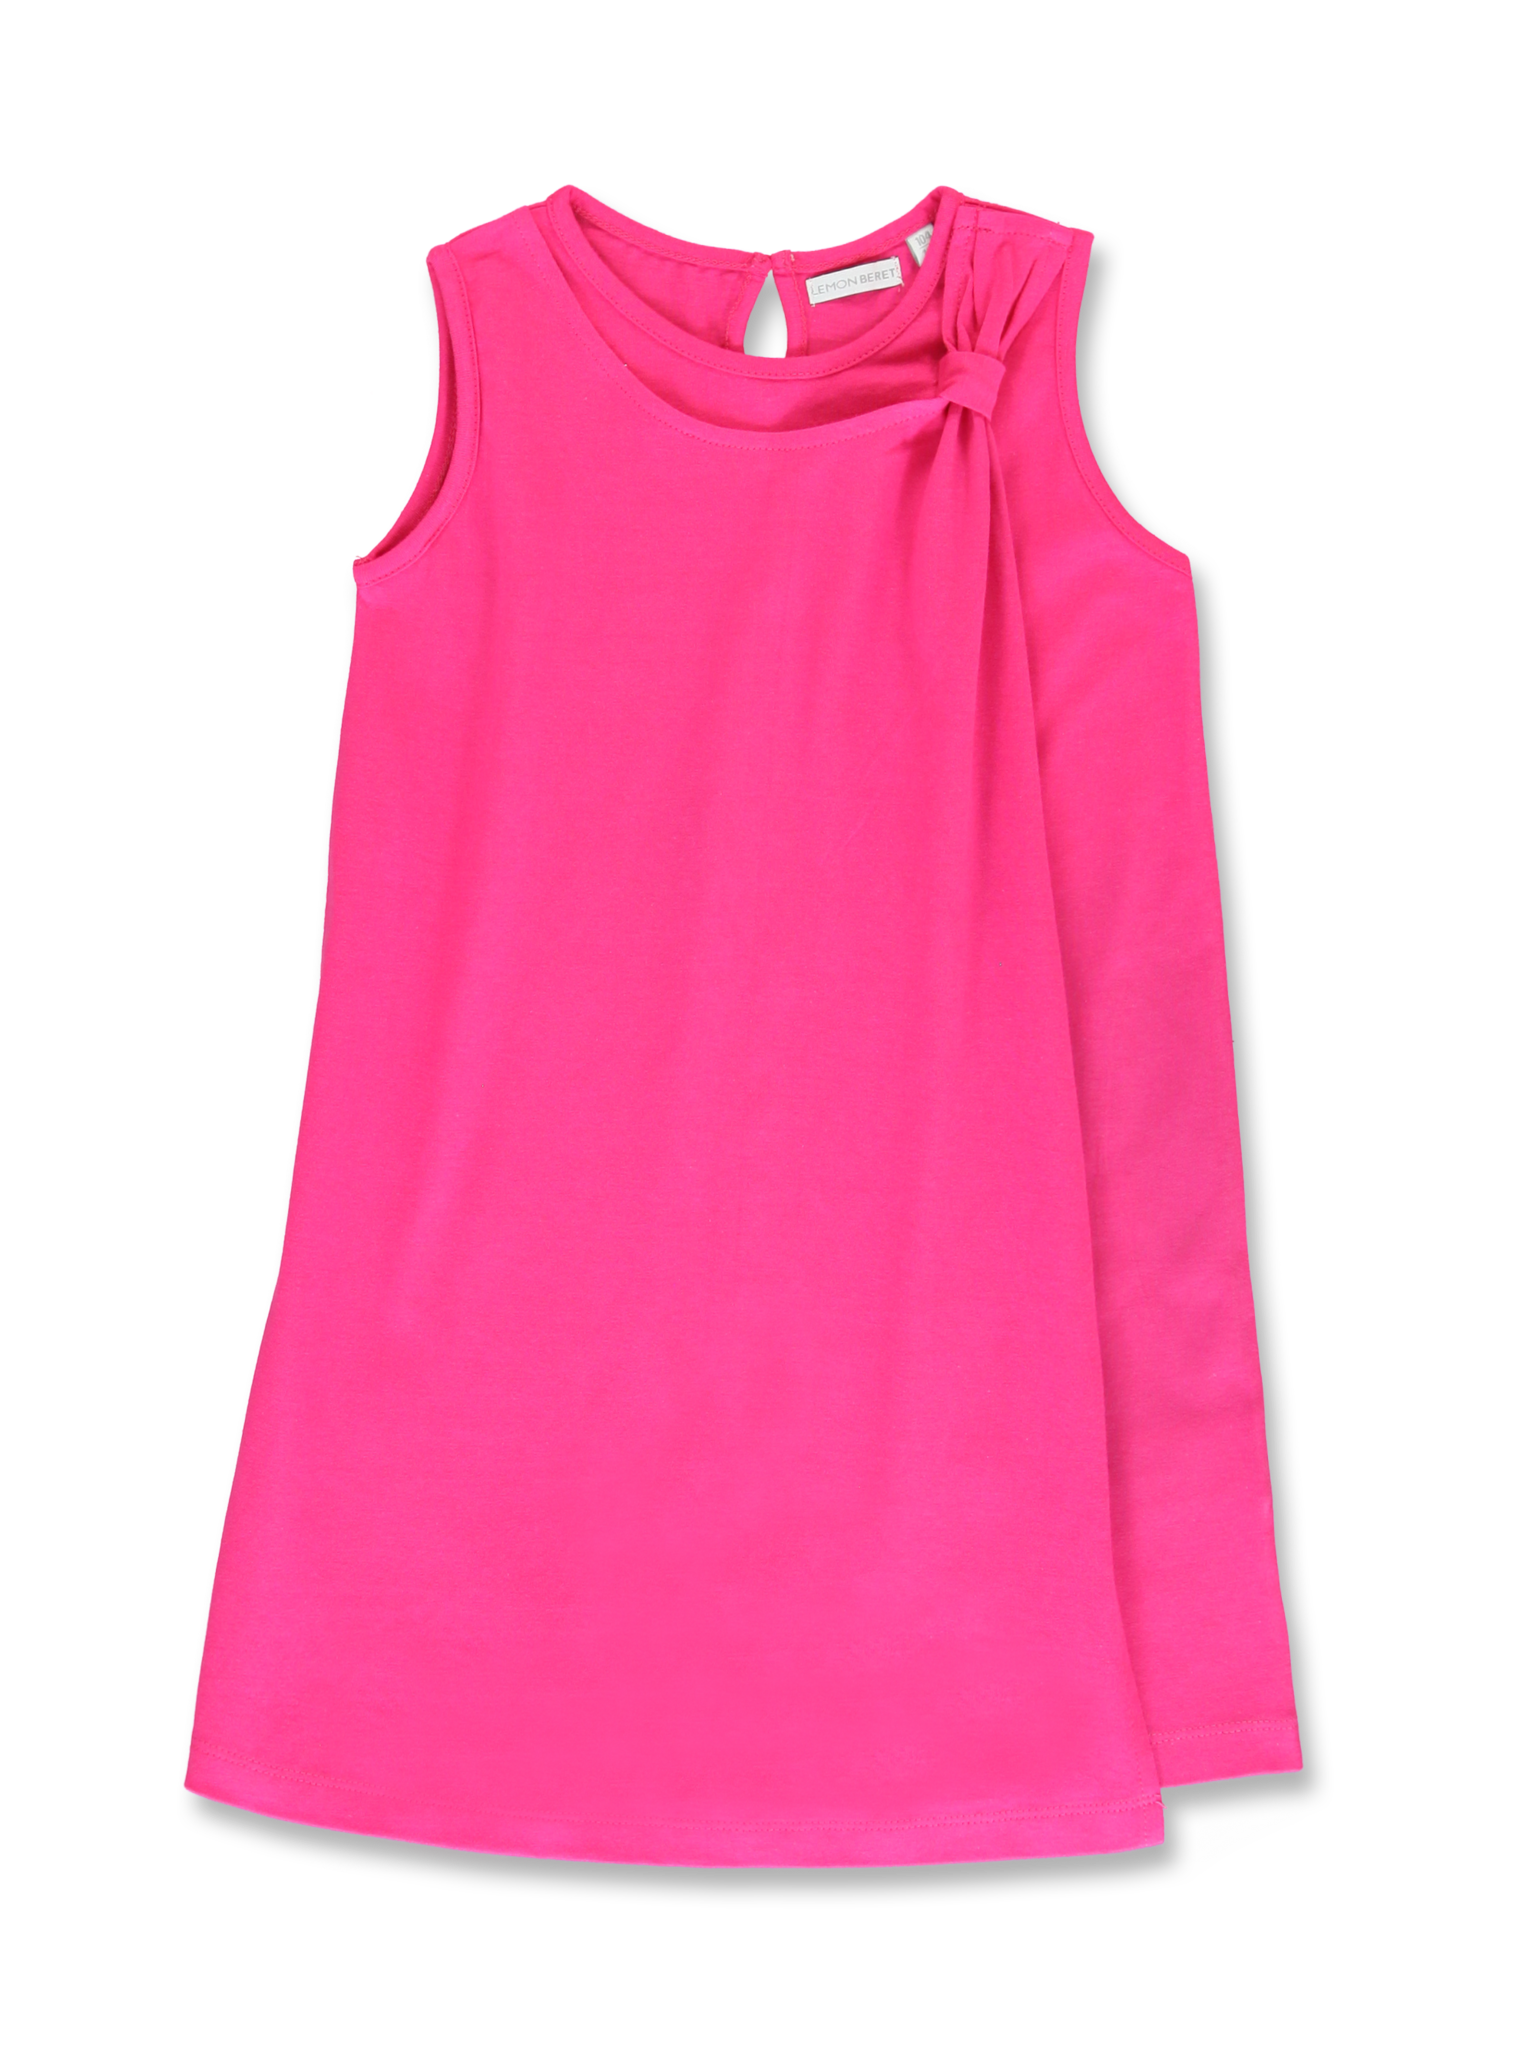 All Brands | Summerproducts Small Girls | Dress | 12 pcs/box